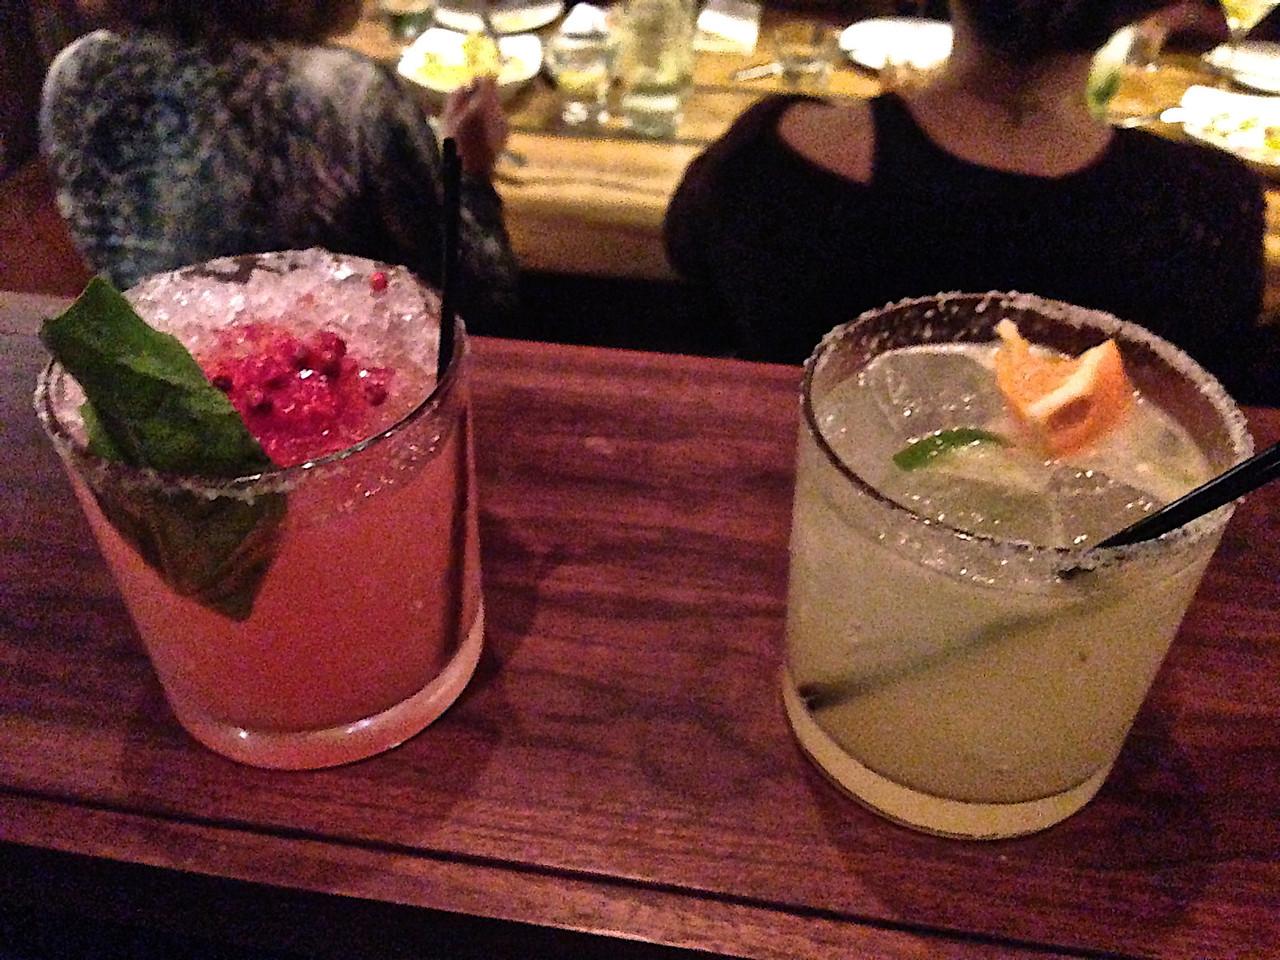 Drinks that are phenom and change seasonally.